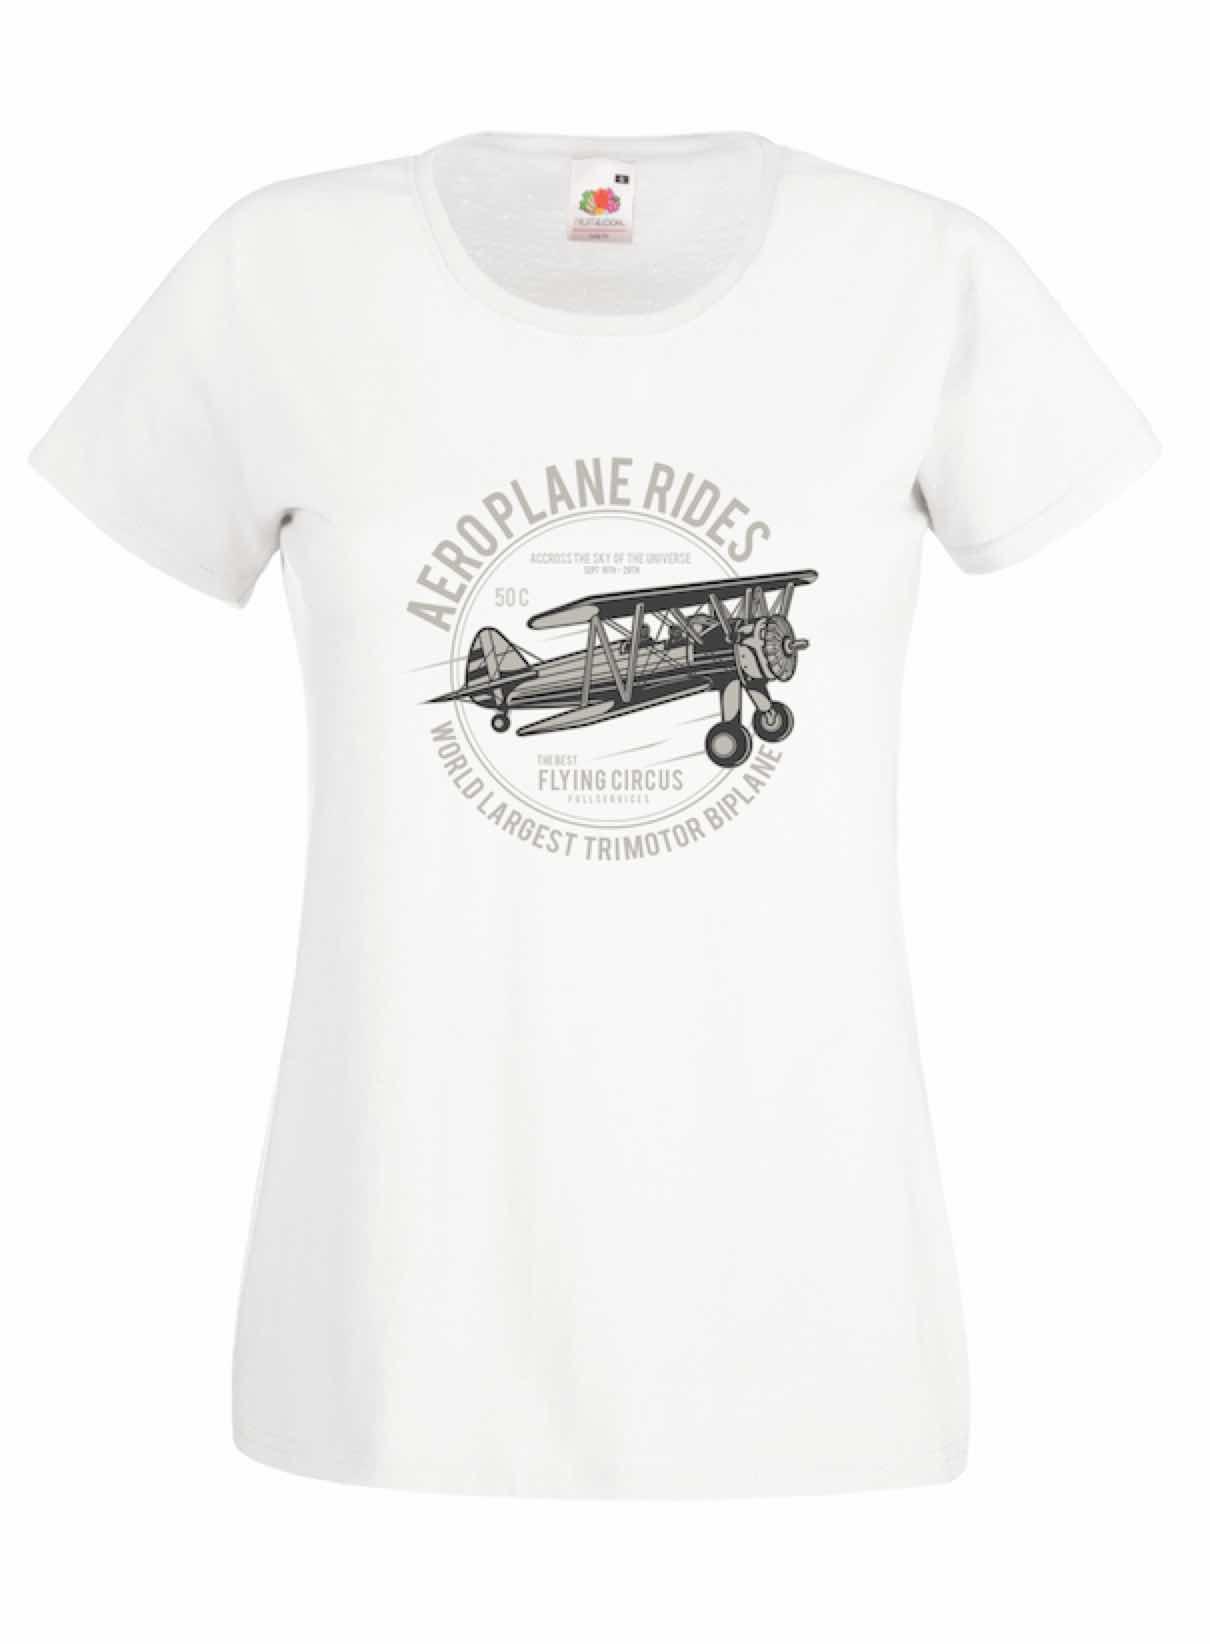 Aeroplane design for t-shirt, hoodie & sweatshirt